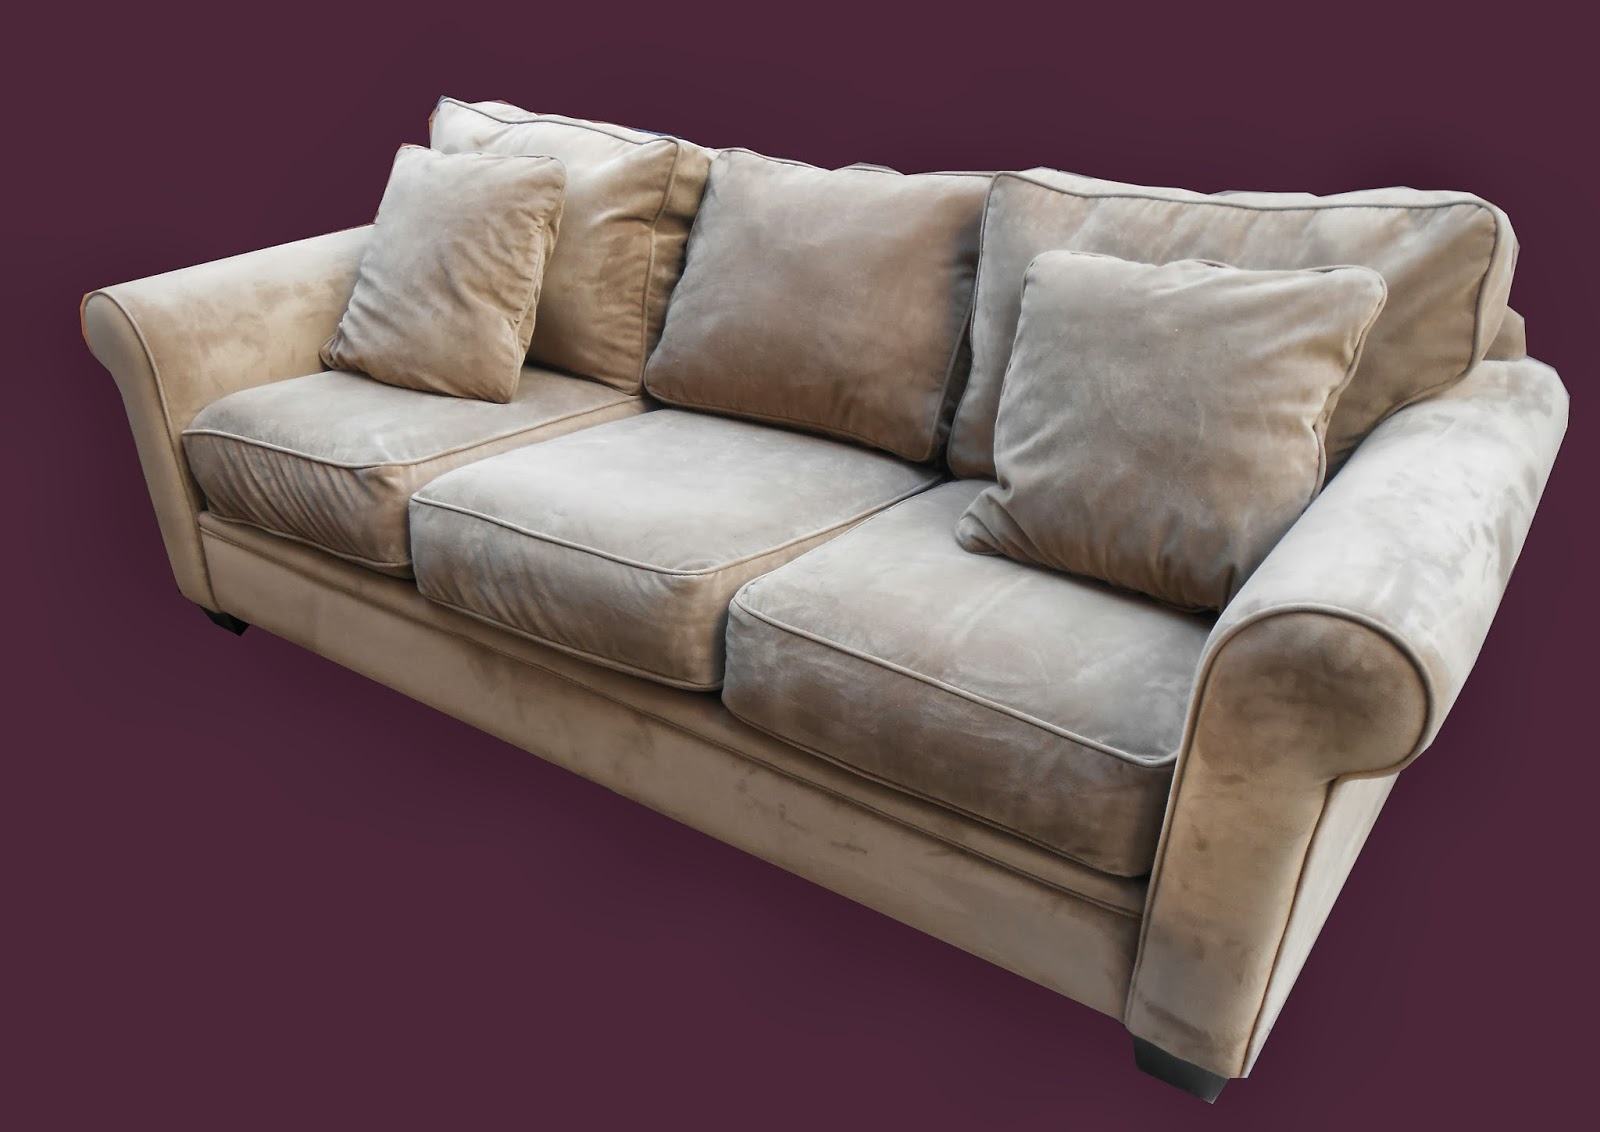 Uhuru Furniture Amp Collectibles Contemporary Ultrasuede